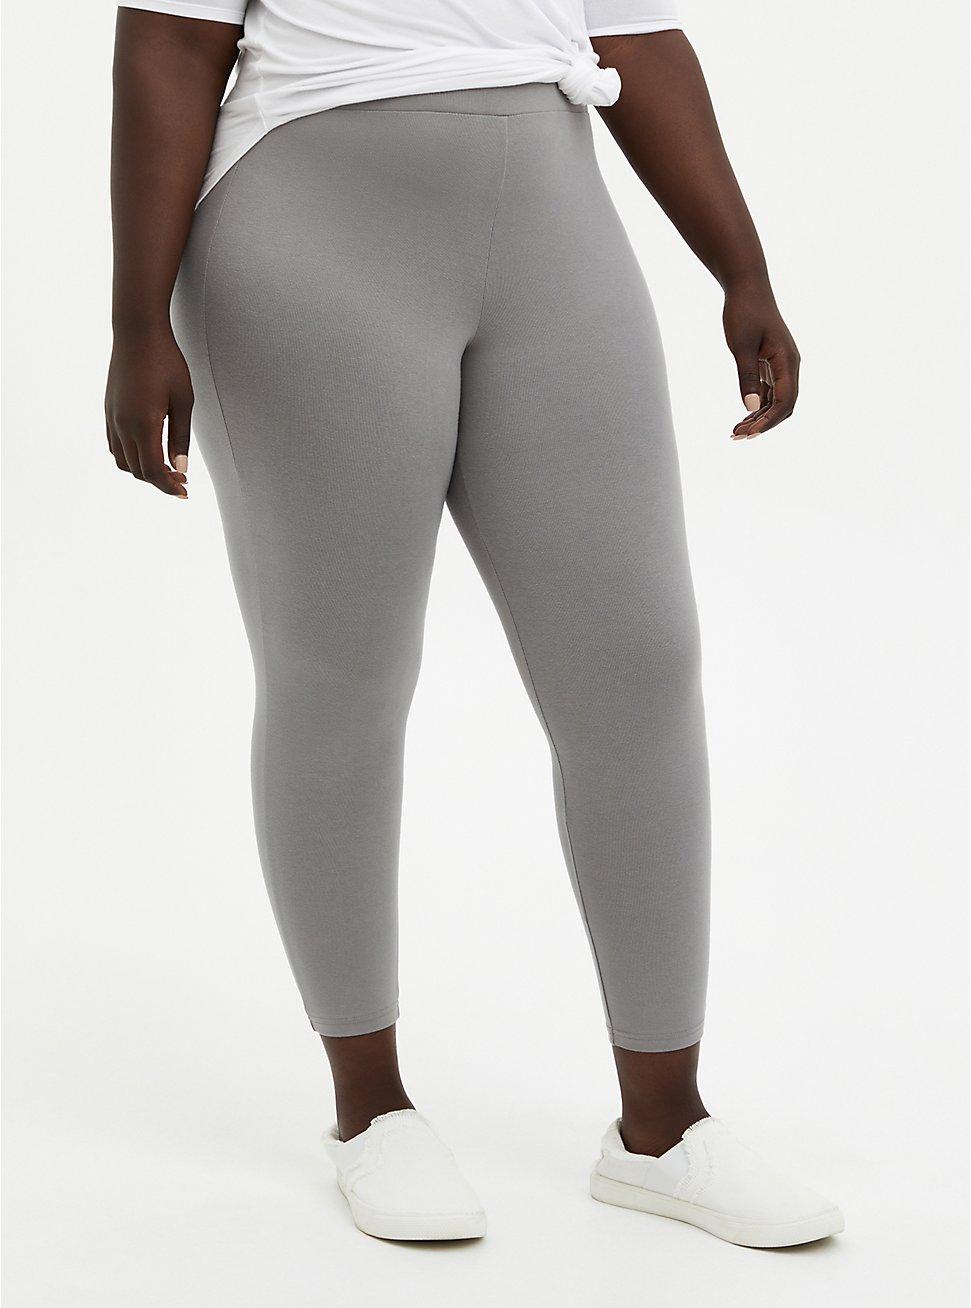 Crop Premium Legging - Grey, GREY, hi-res